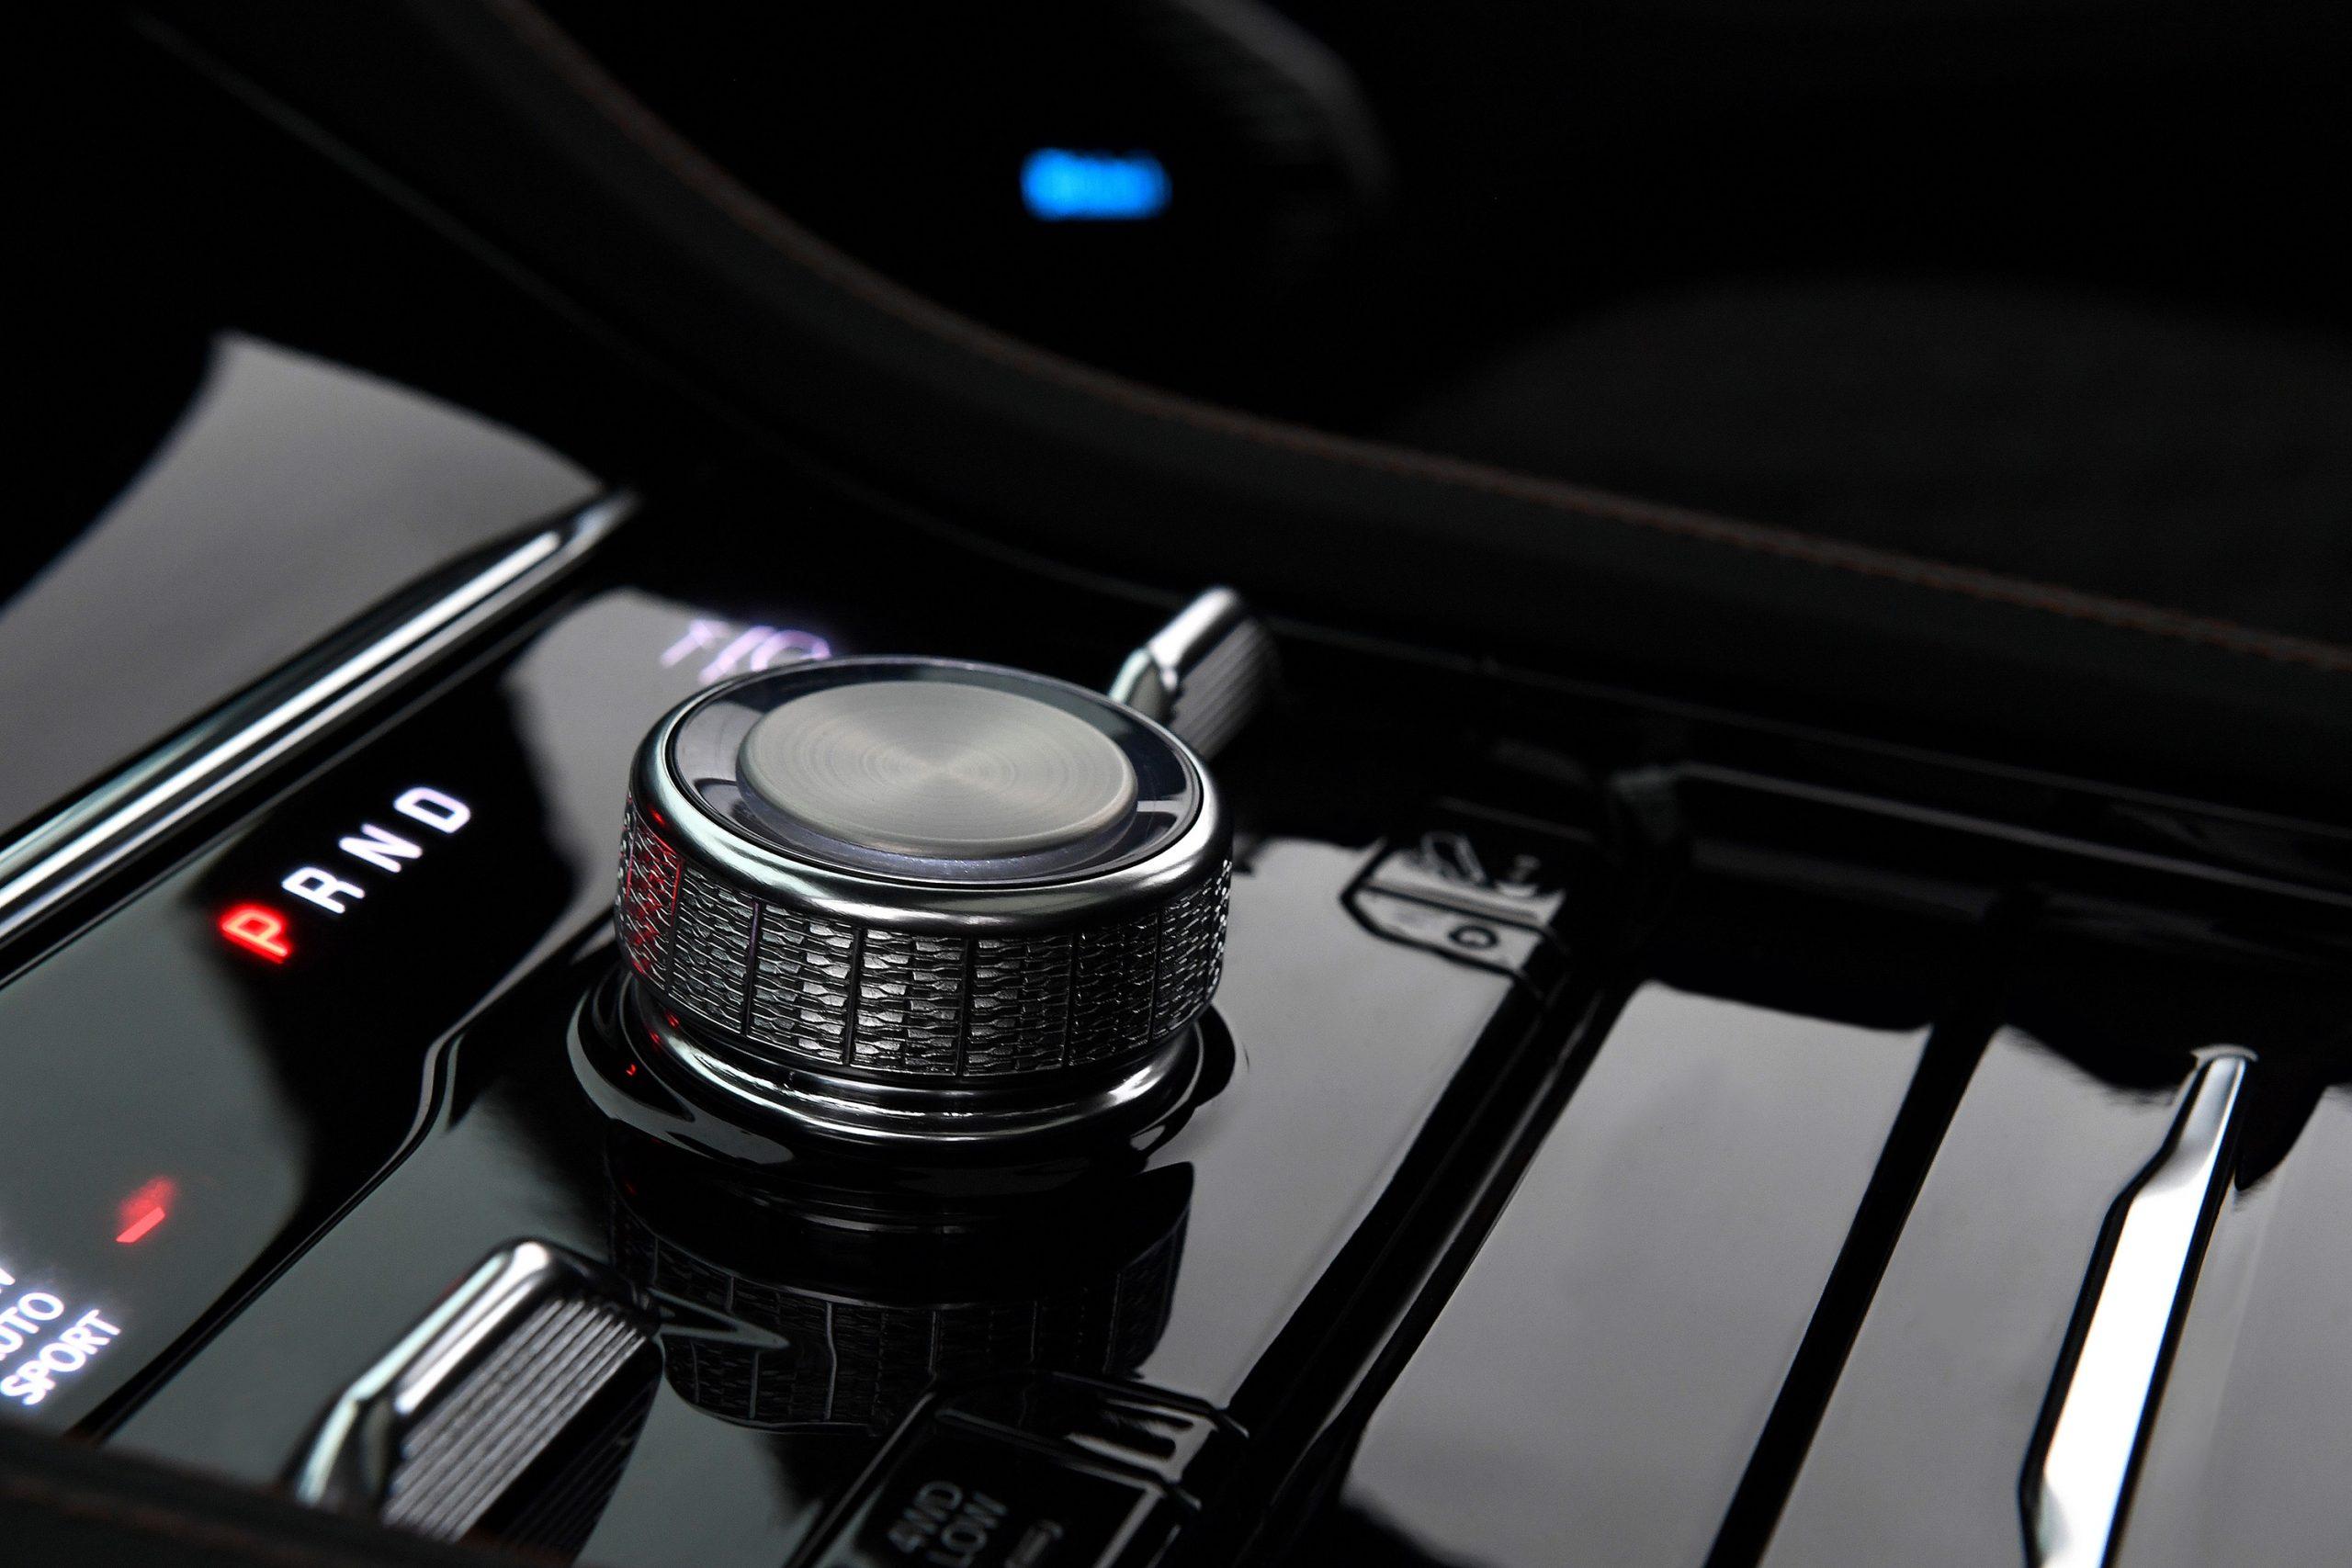 2022 Jeep Grand Cherokee rotary shifter